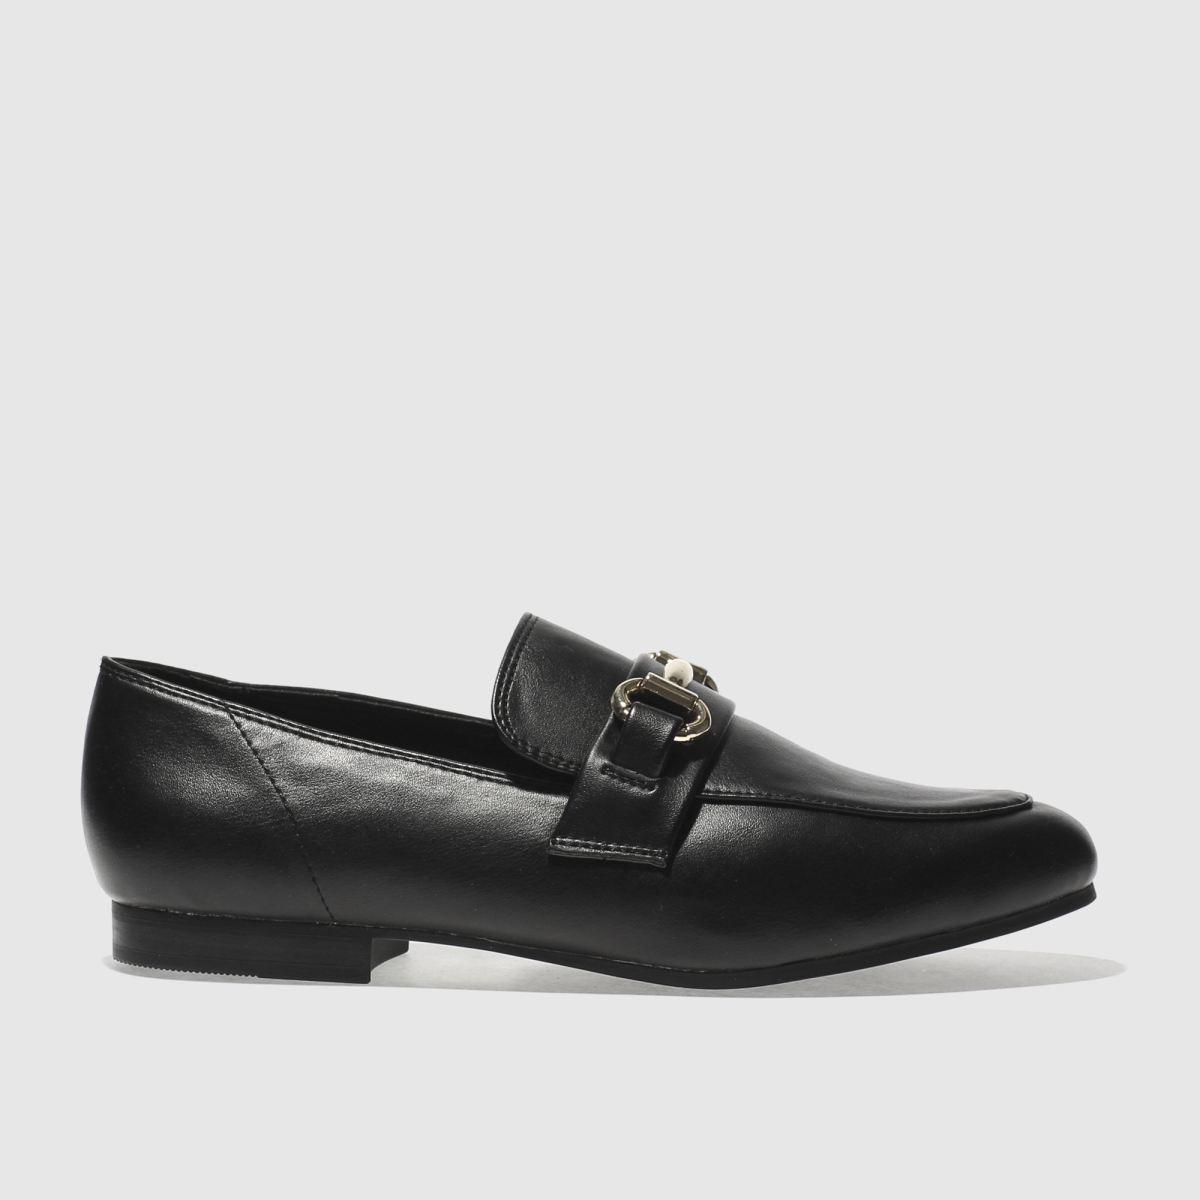 schuh Schuh Black Dapper Flat Shoes